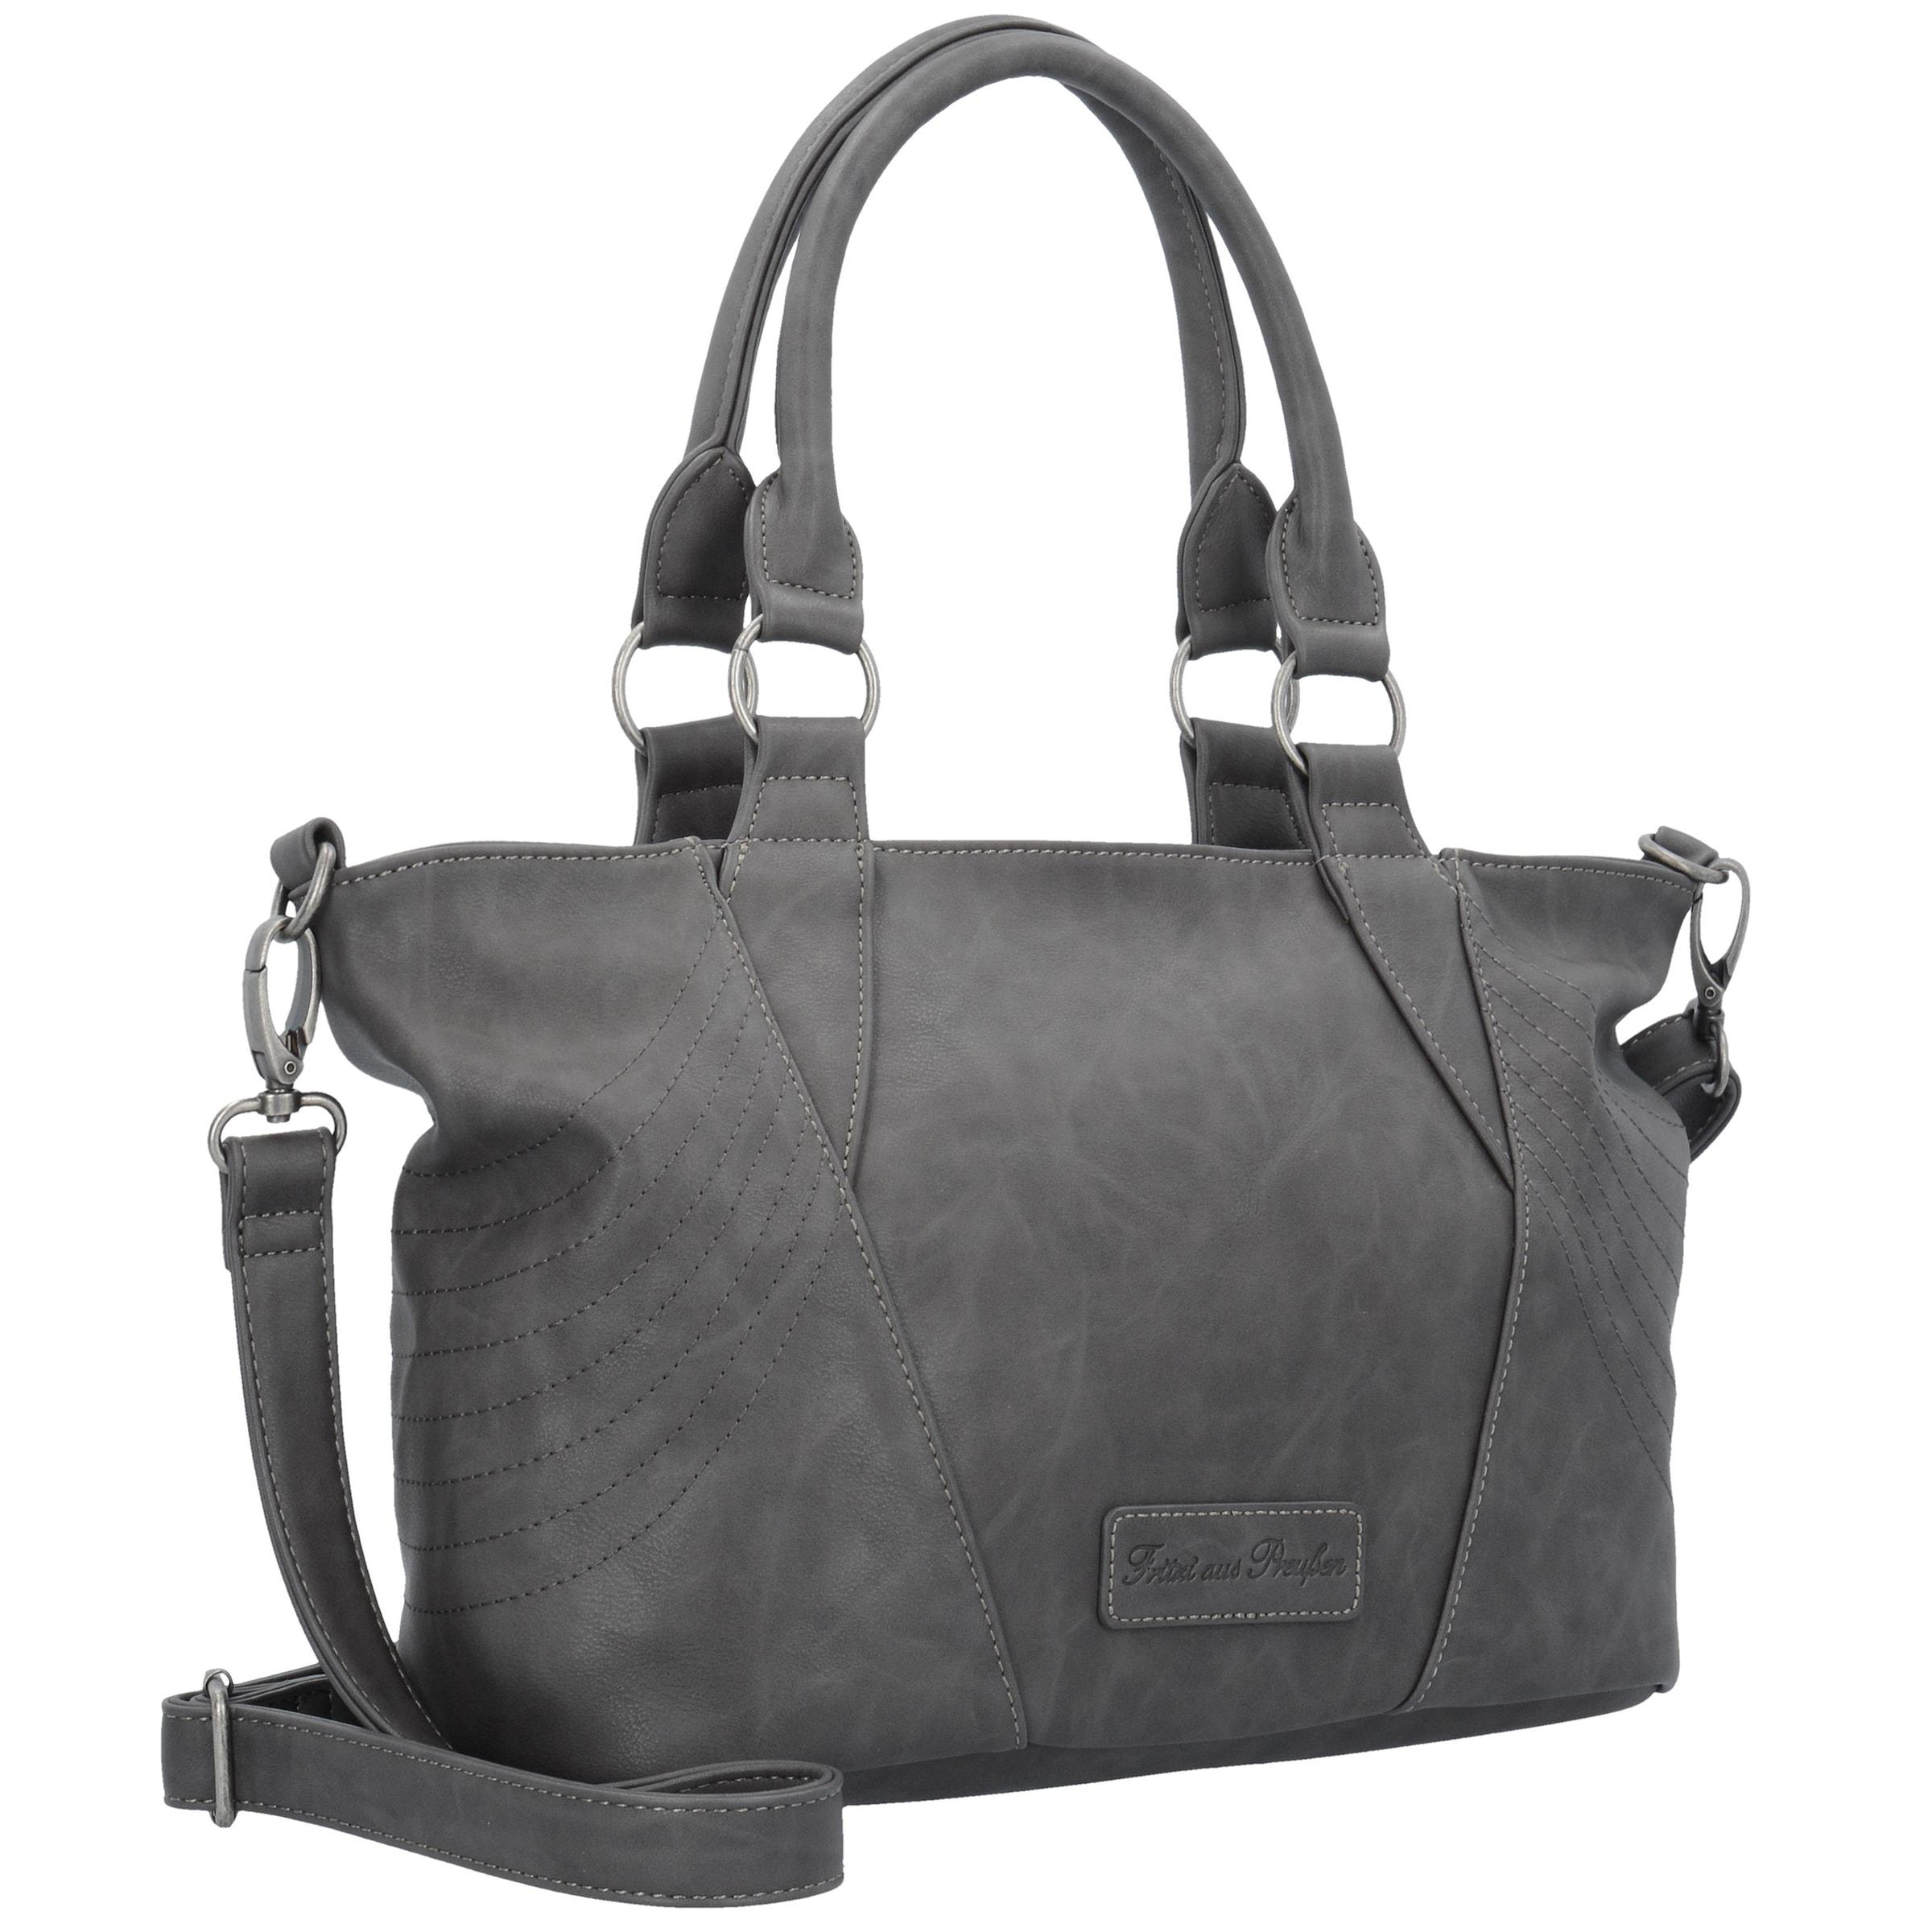 Fritzi aus Preußen 'Pilar' Handtasche 34 cm Rabatt Authentische Online Erkunden Günstig Online OHAKkvXd0